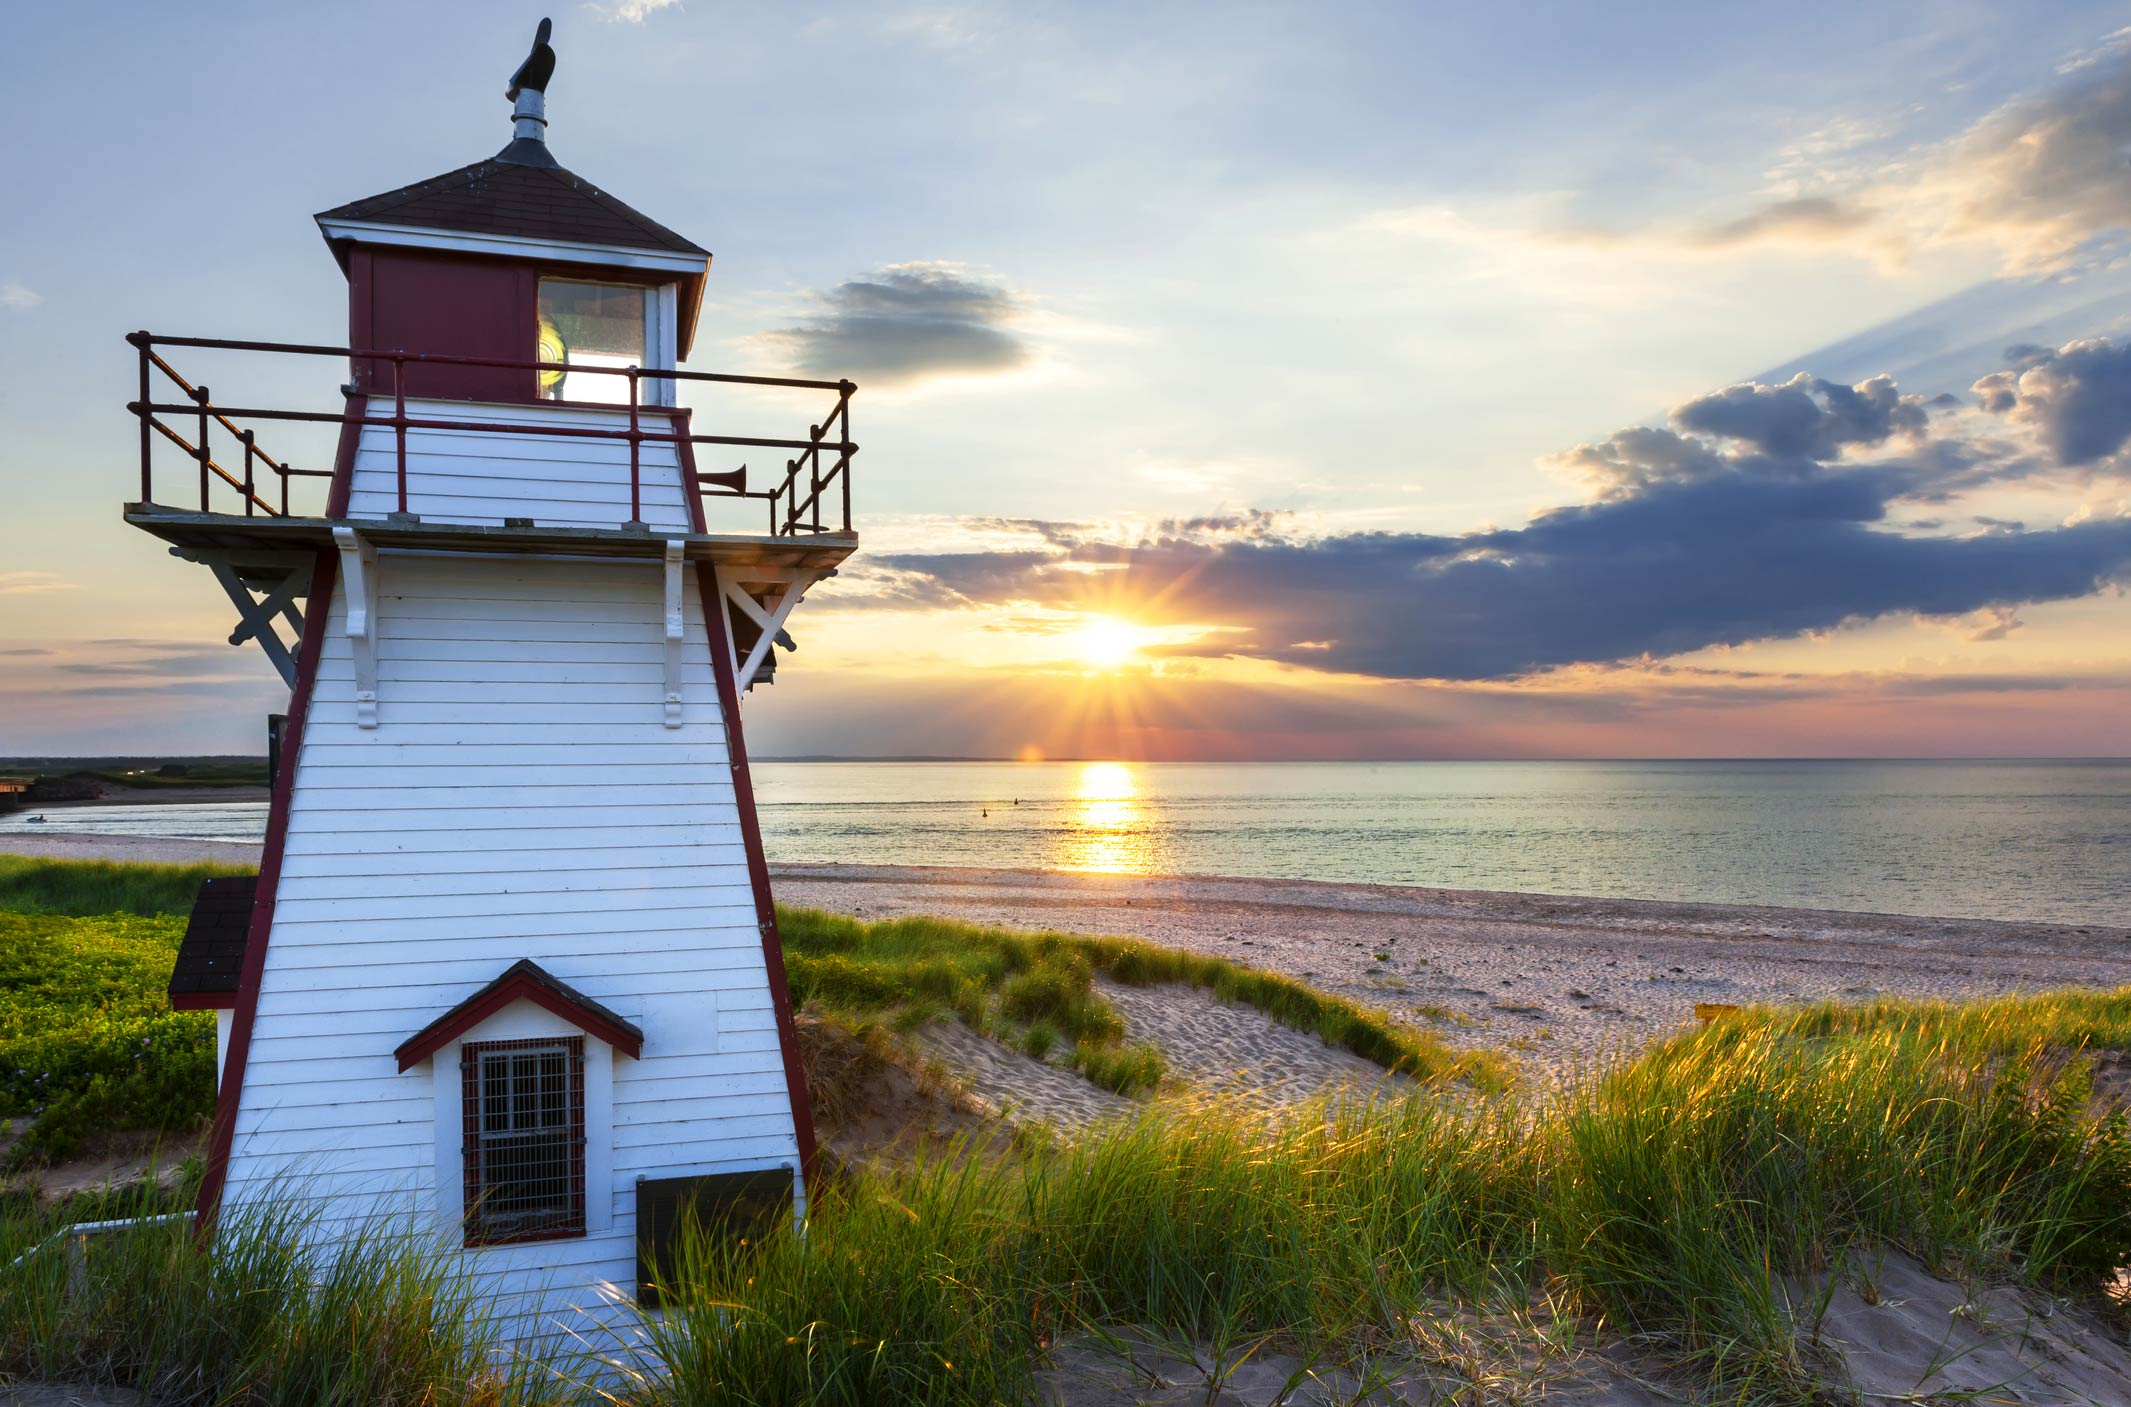 Prince Edward Island Immigration